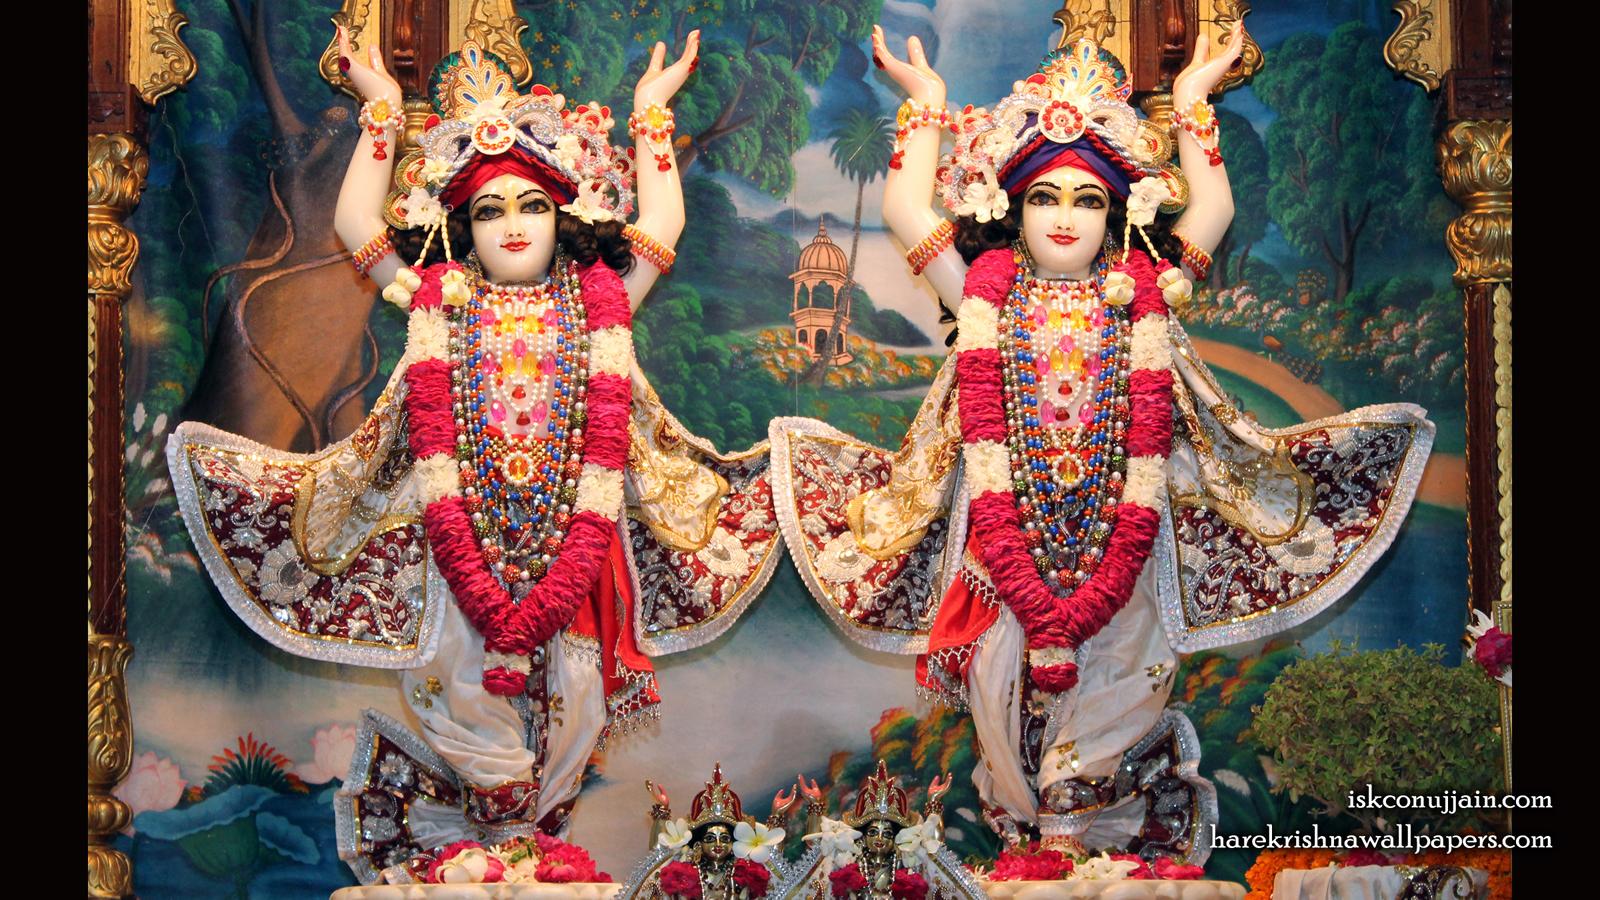 Sri Sri Gaura Nitai Wallpaper (010) Size 1600x900 Download